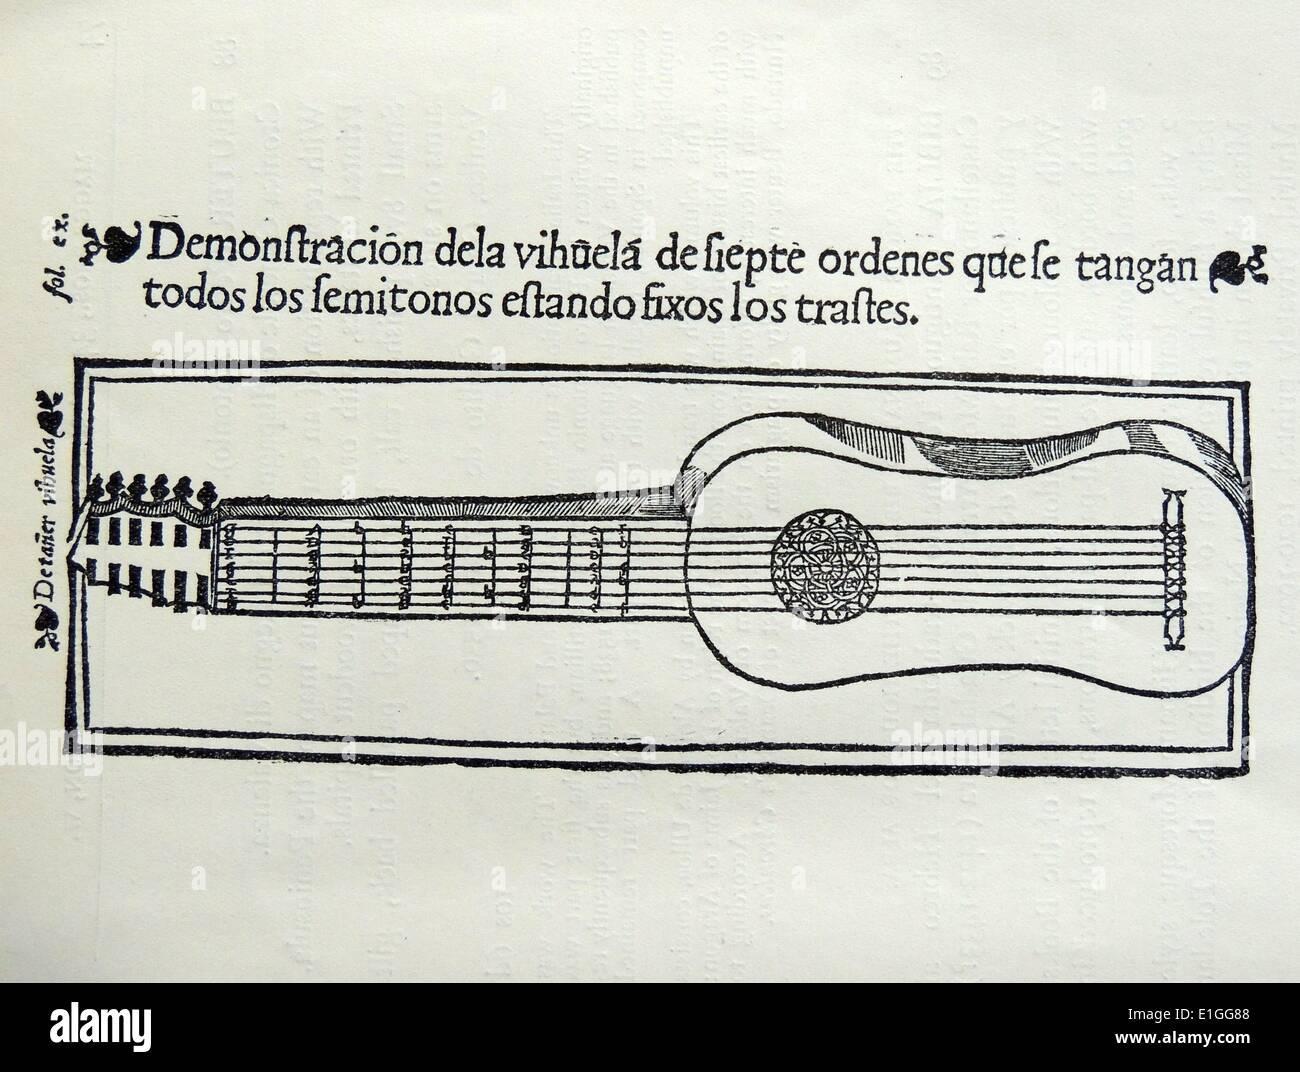 "Xilogravura de Bermudo Declaracio de exercício correndo Musicales"". Oussuna. Datada de 1555 Imagens de Stock"